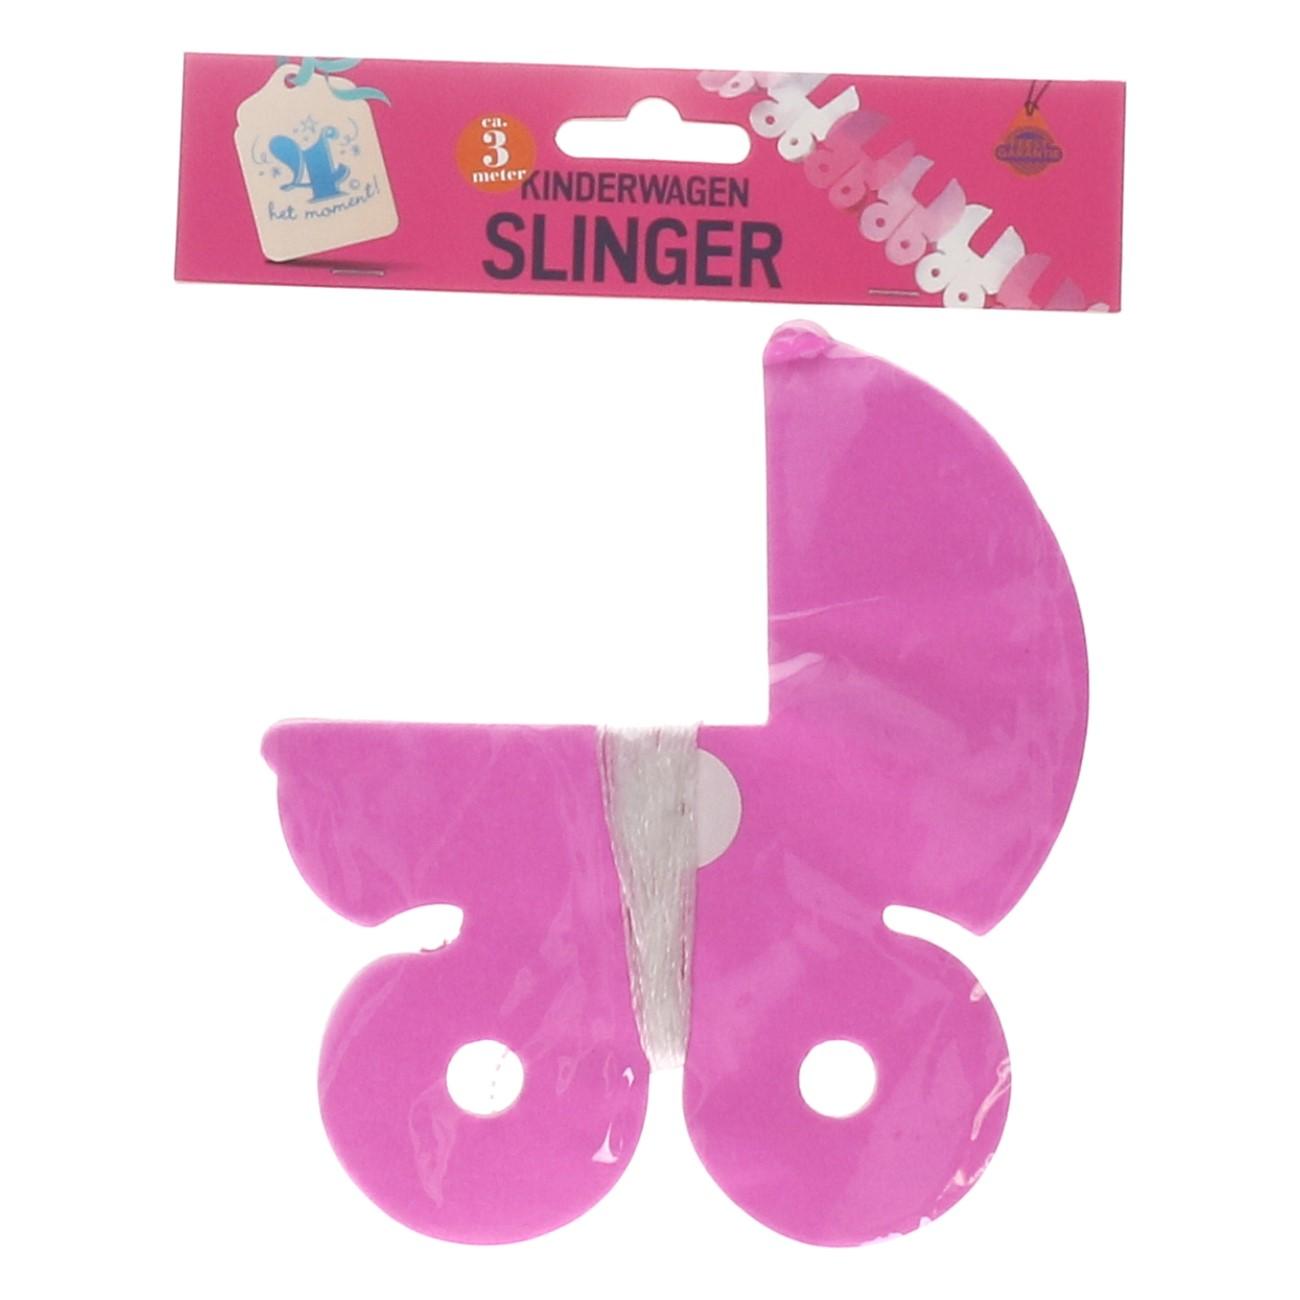 Slinger kinderwagen roze